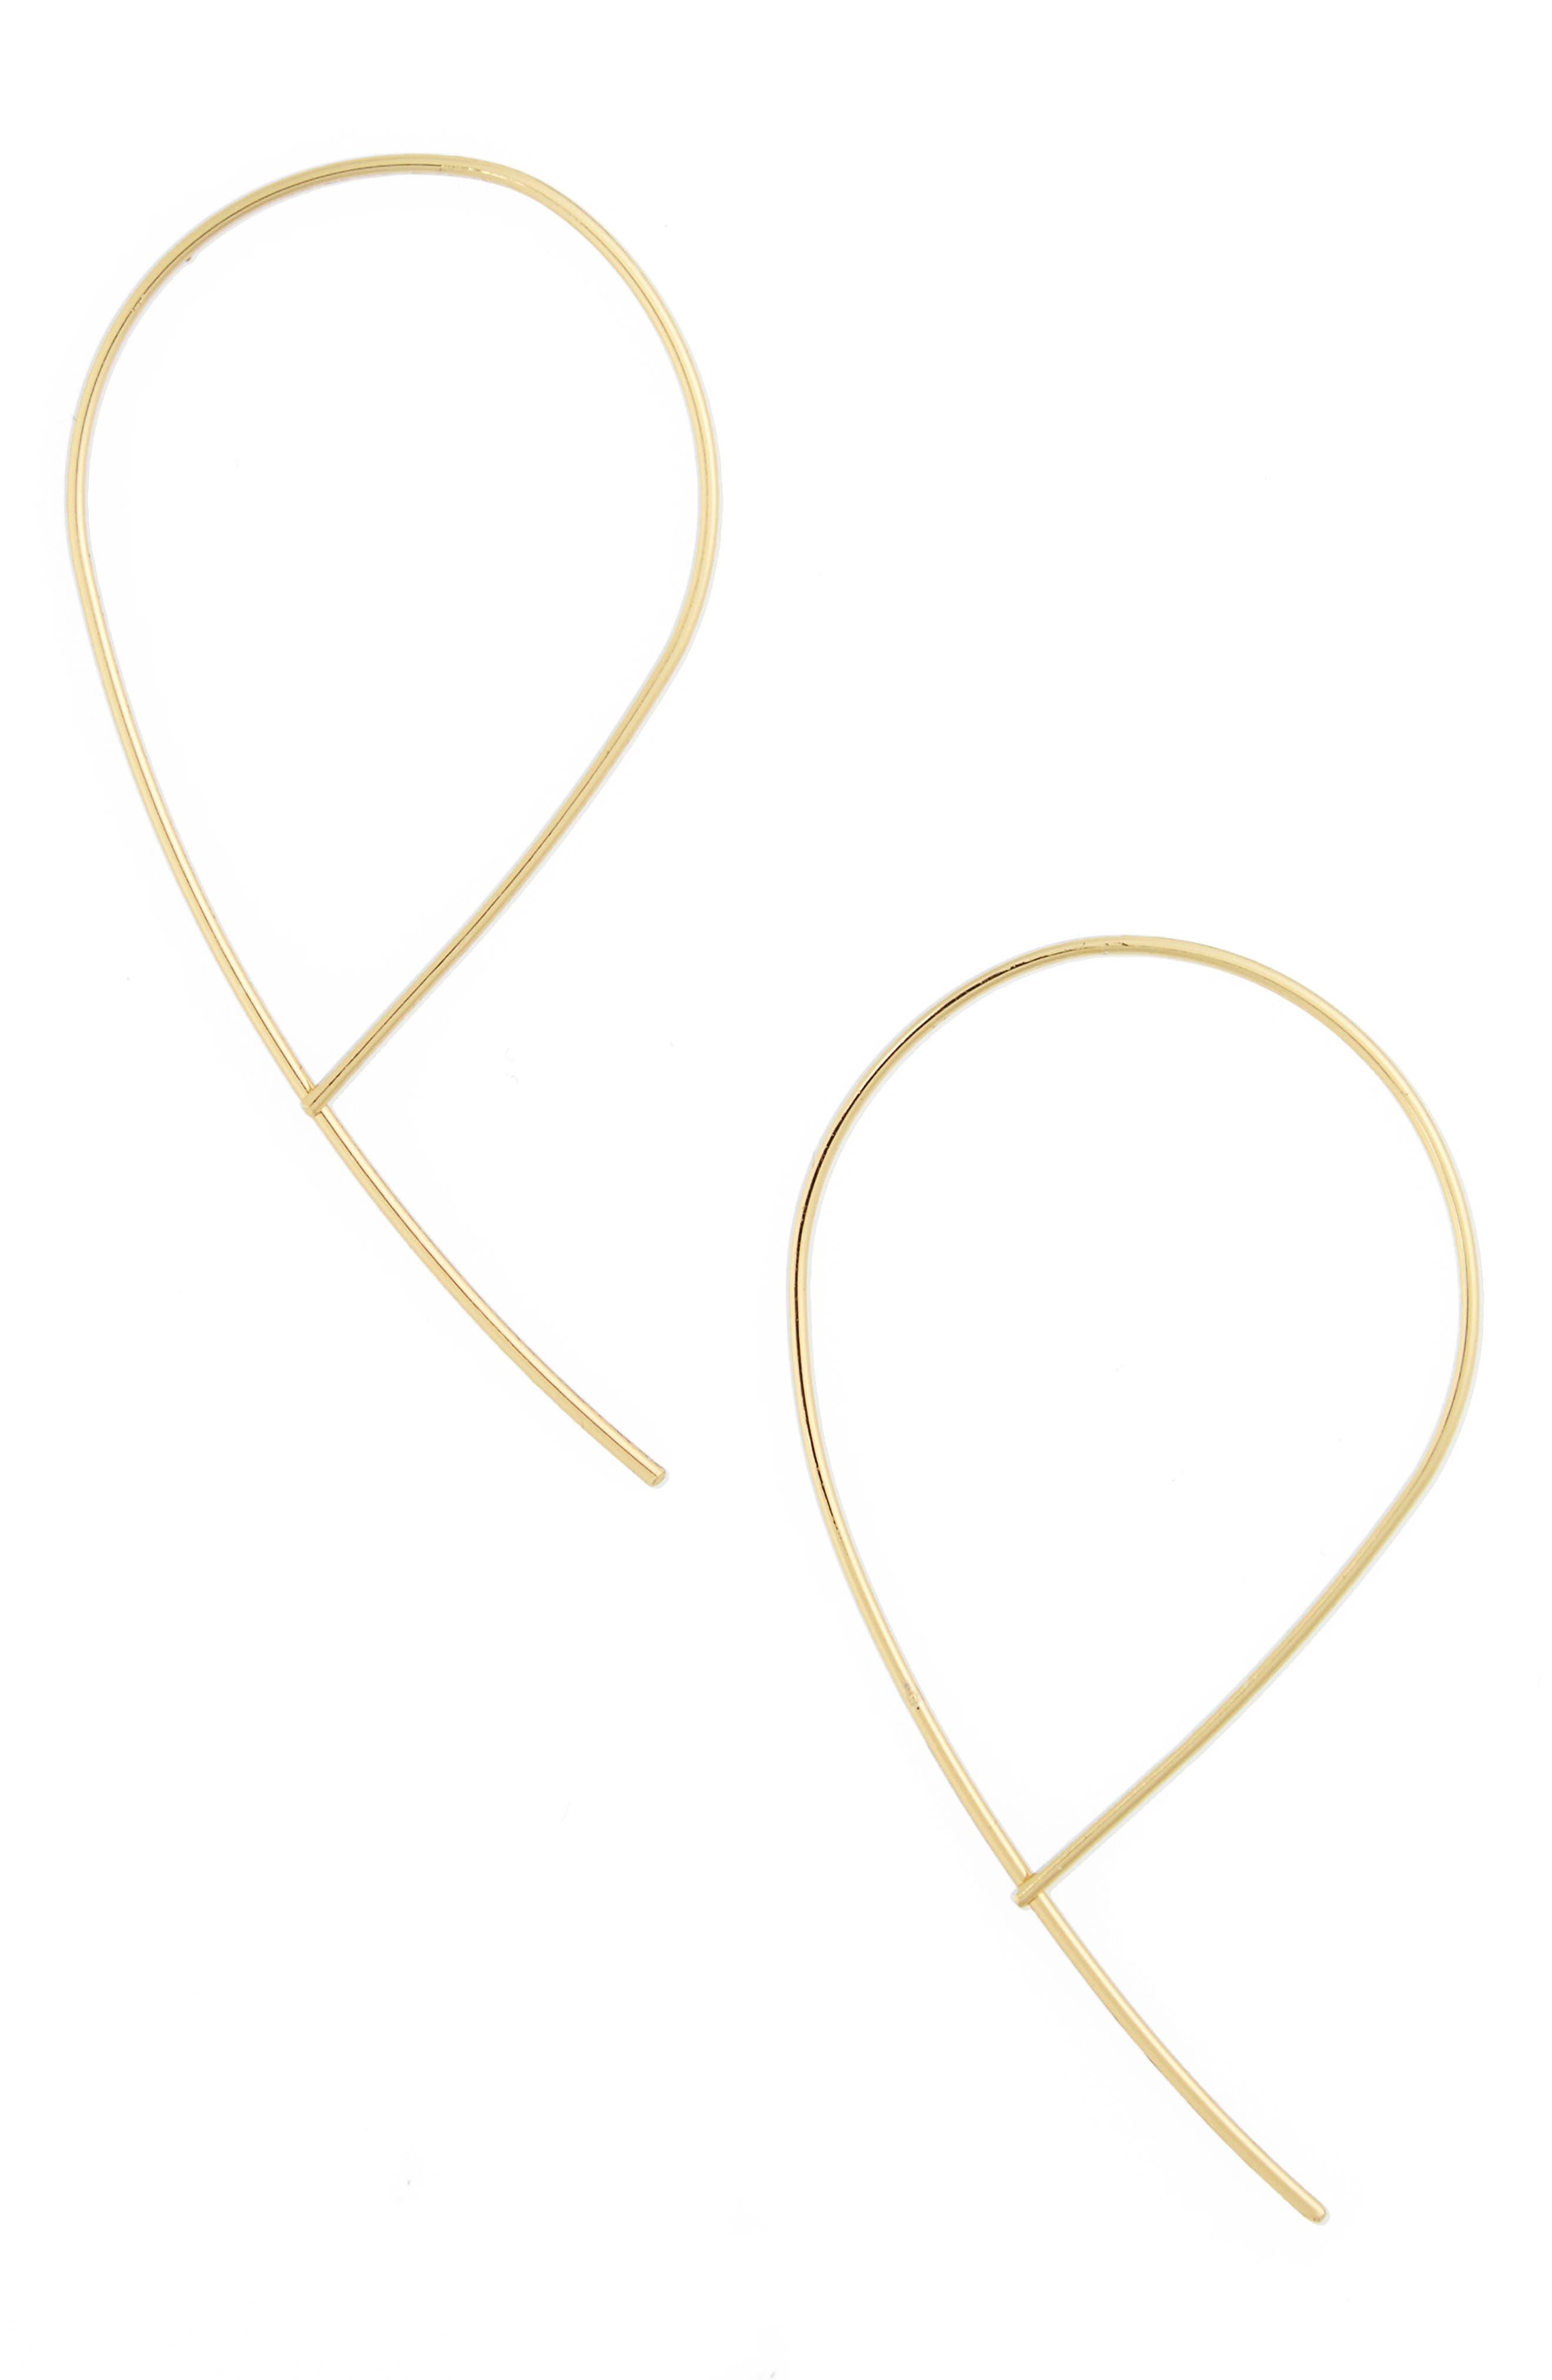 Arie Threader Earrings,                         Main,                         color, GOLD